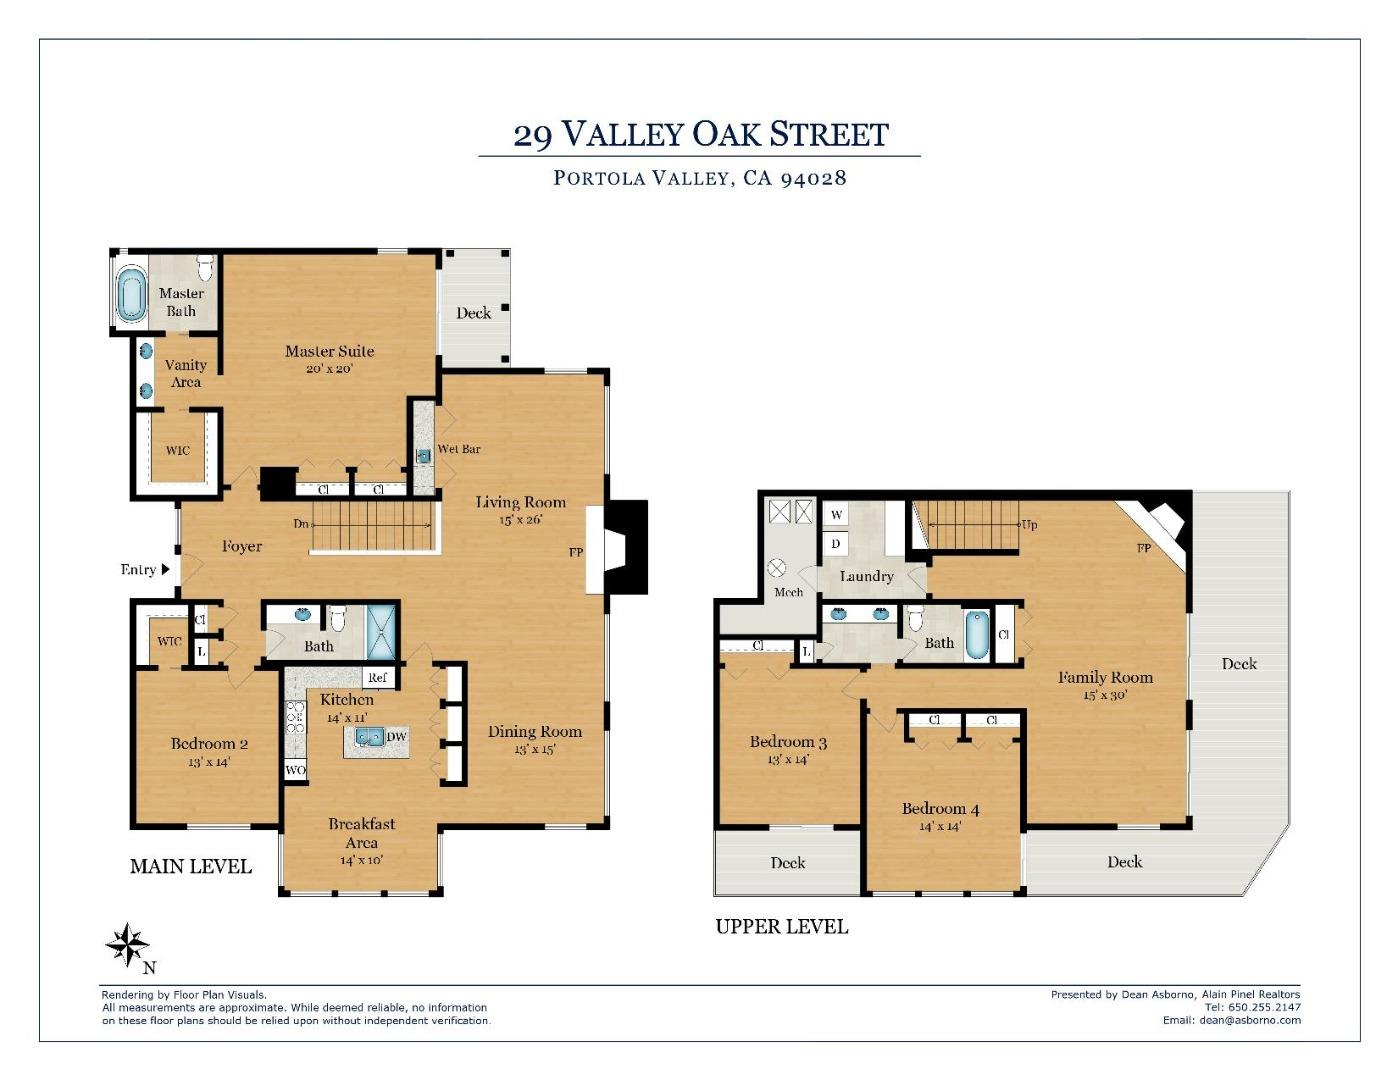 29 Valley Oak Street, Portola Valley, CA 94028